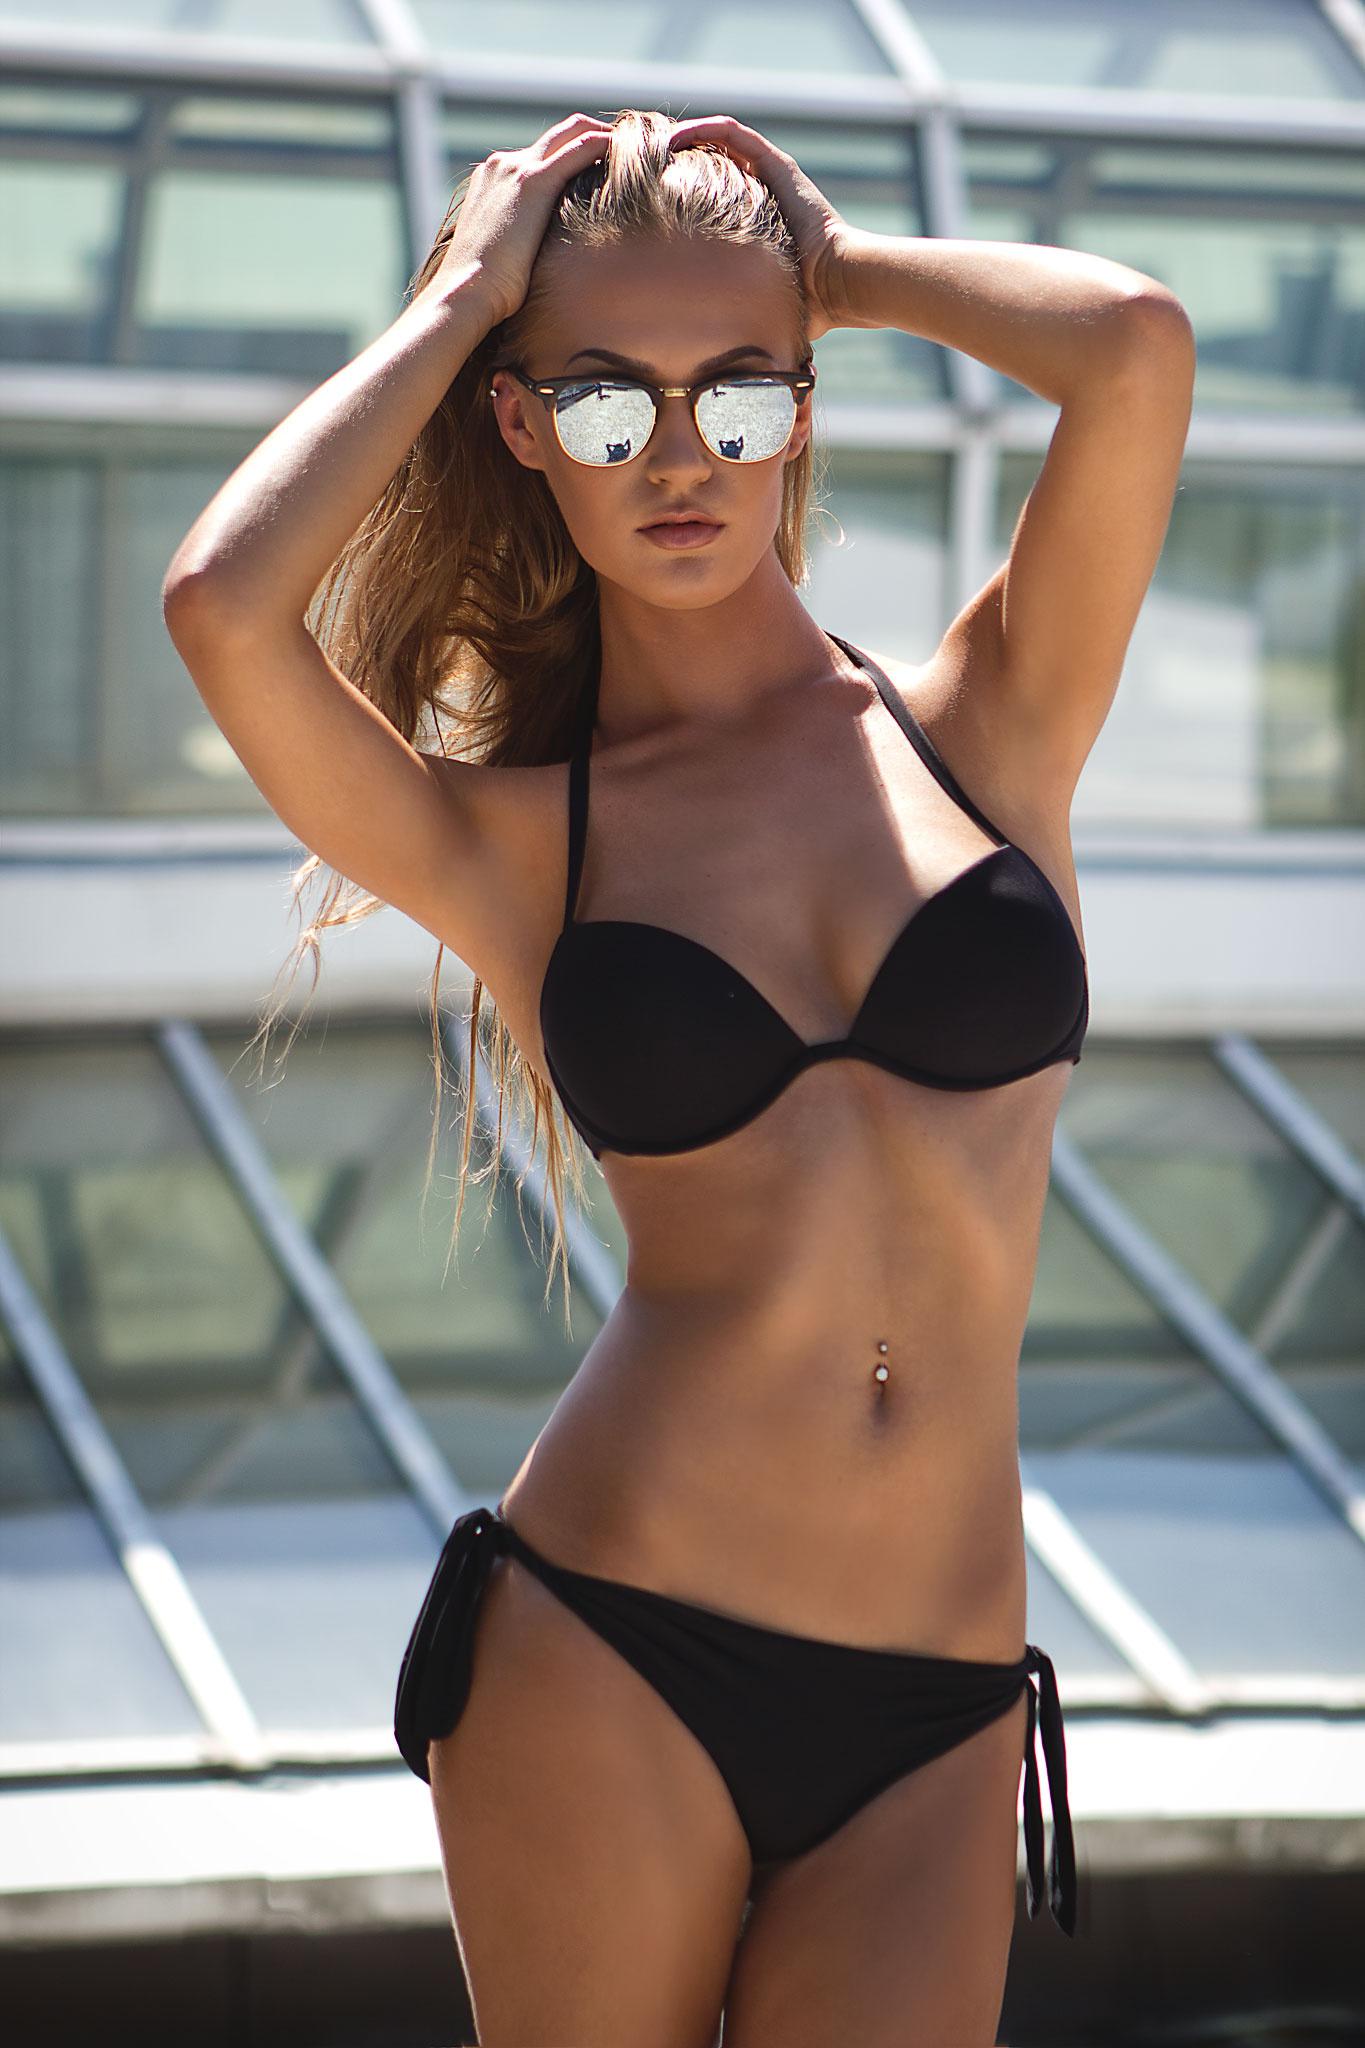 black swimsuit girl beautiful model